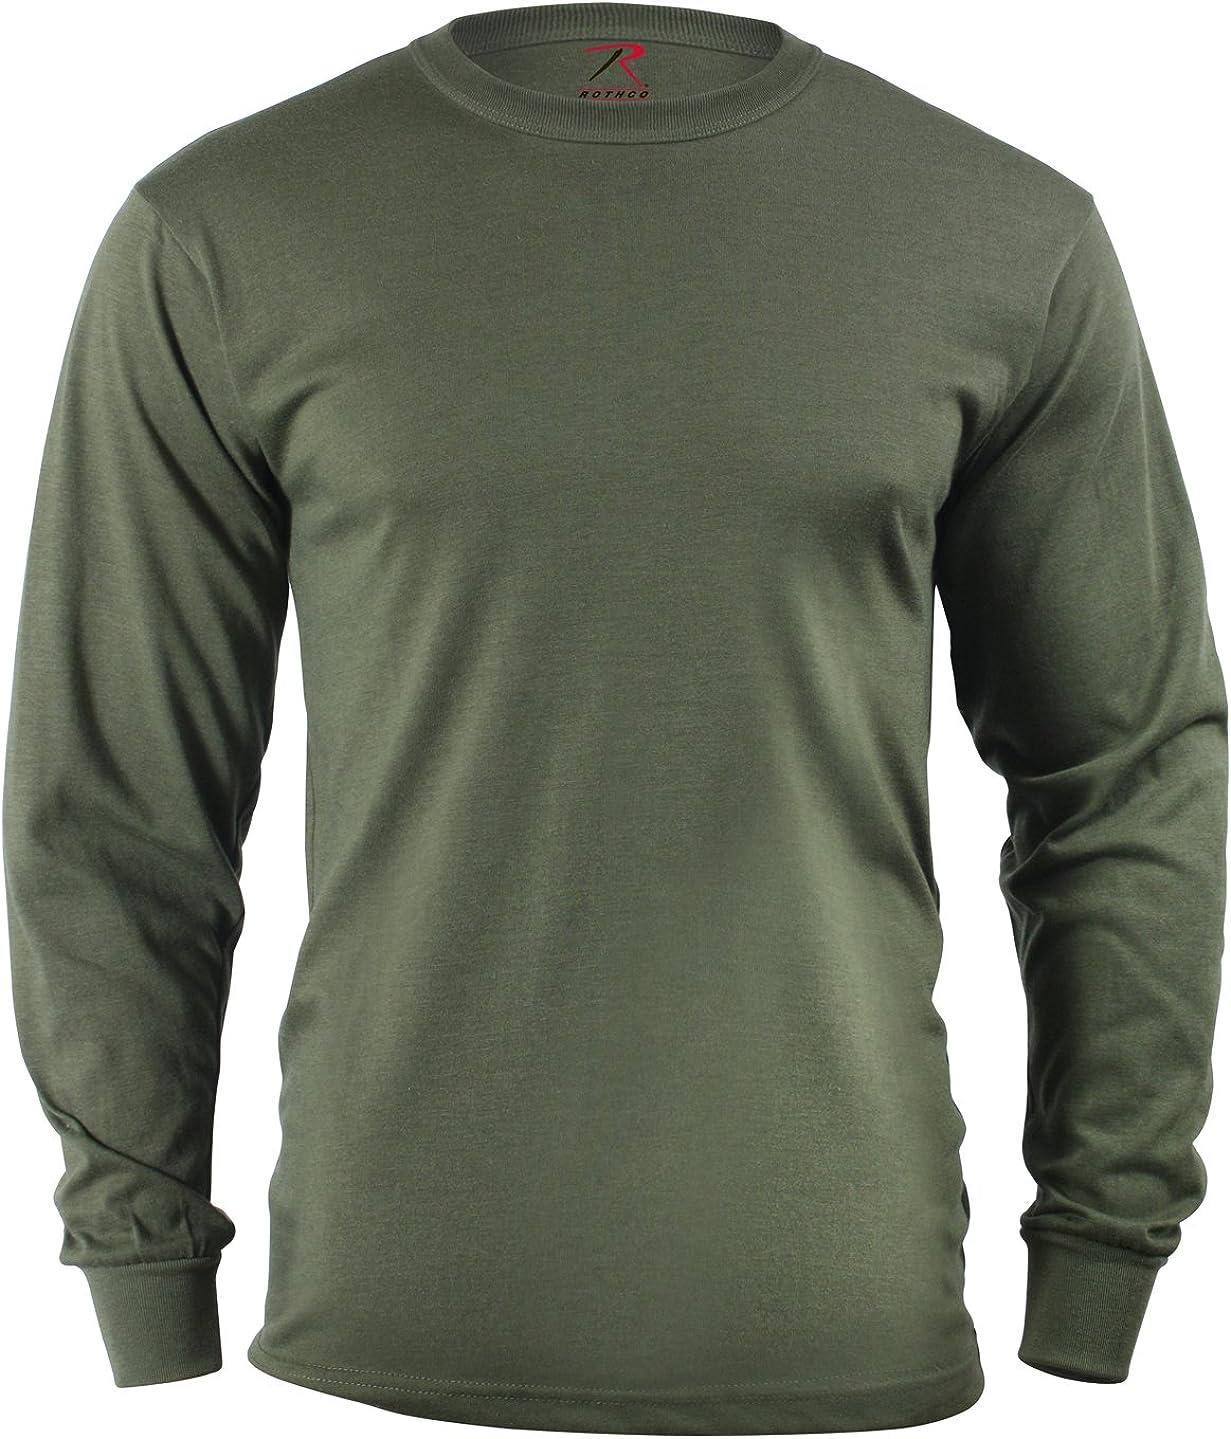 Dedication Max 82% OFF Rothco Long Sleeve Solid T-Shirt